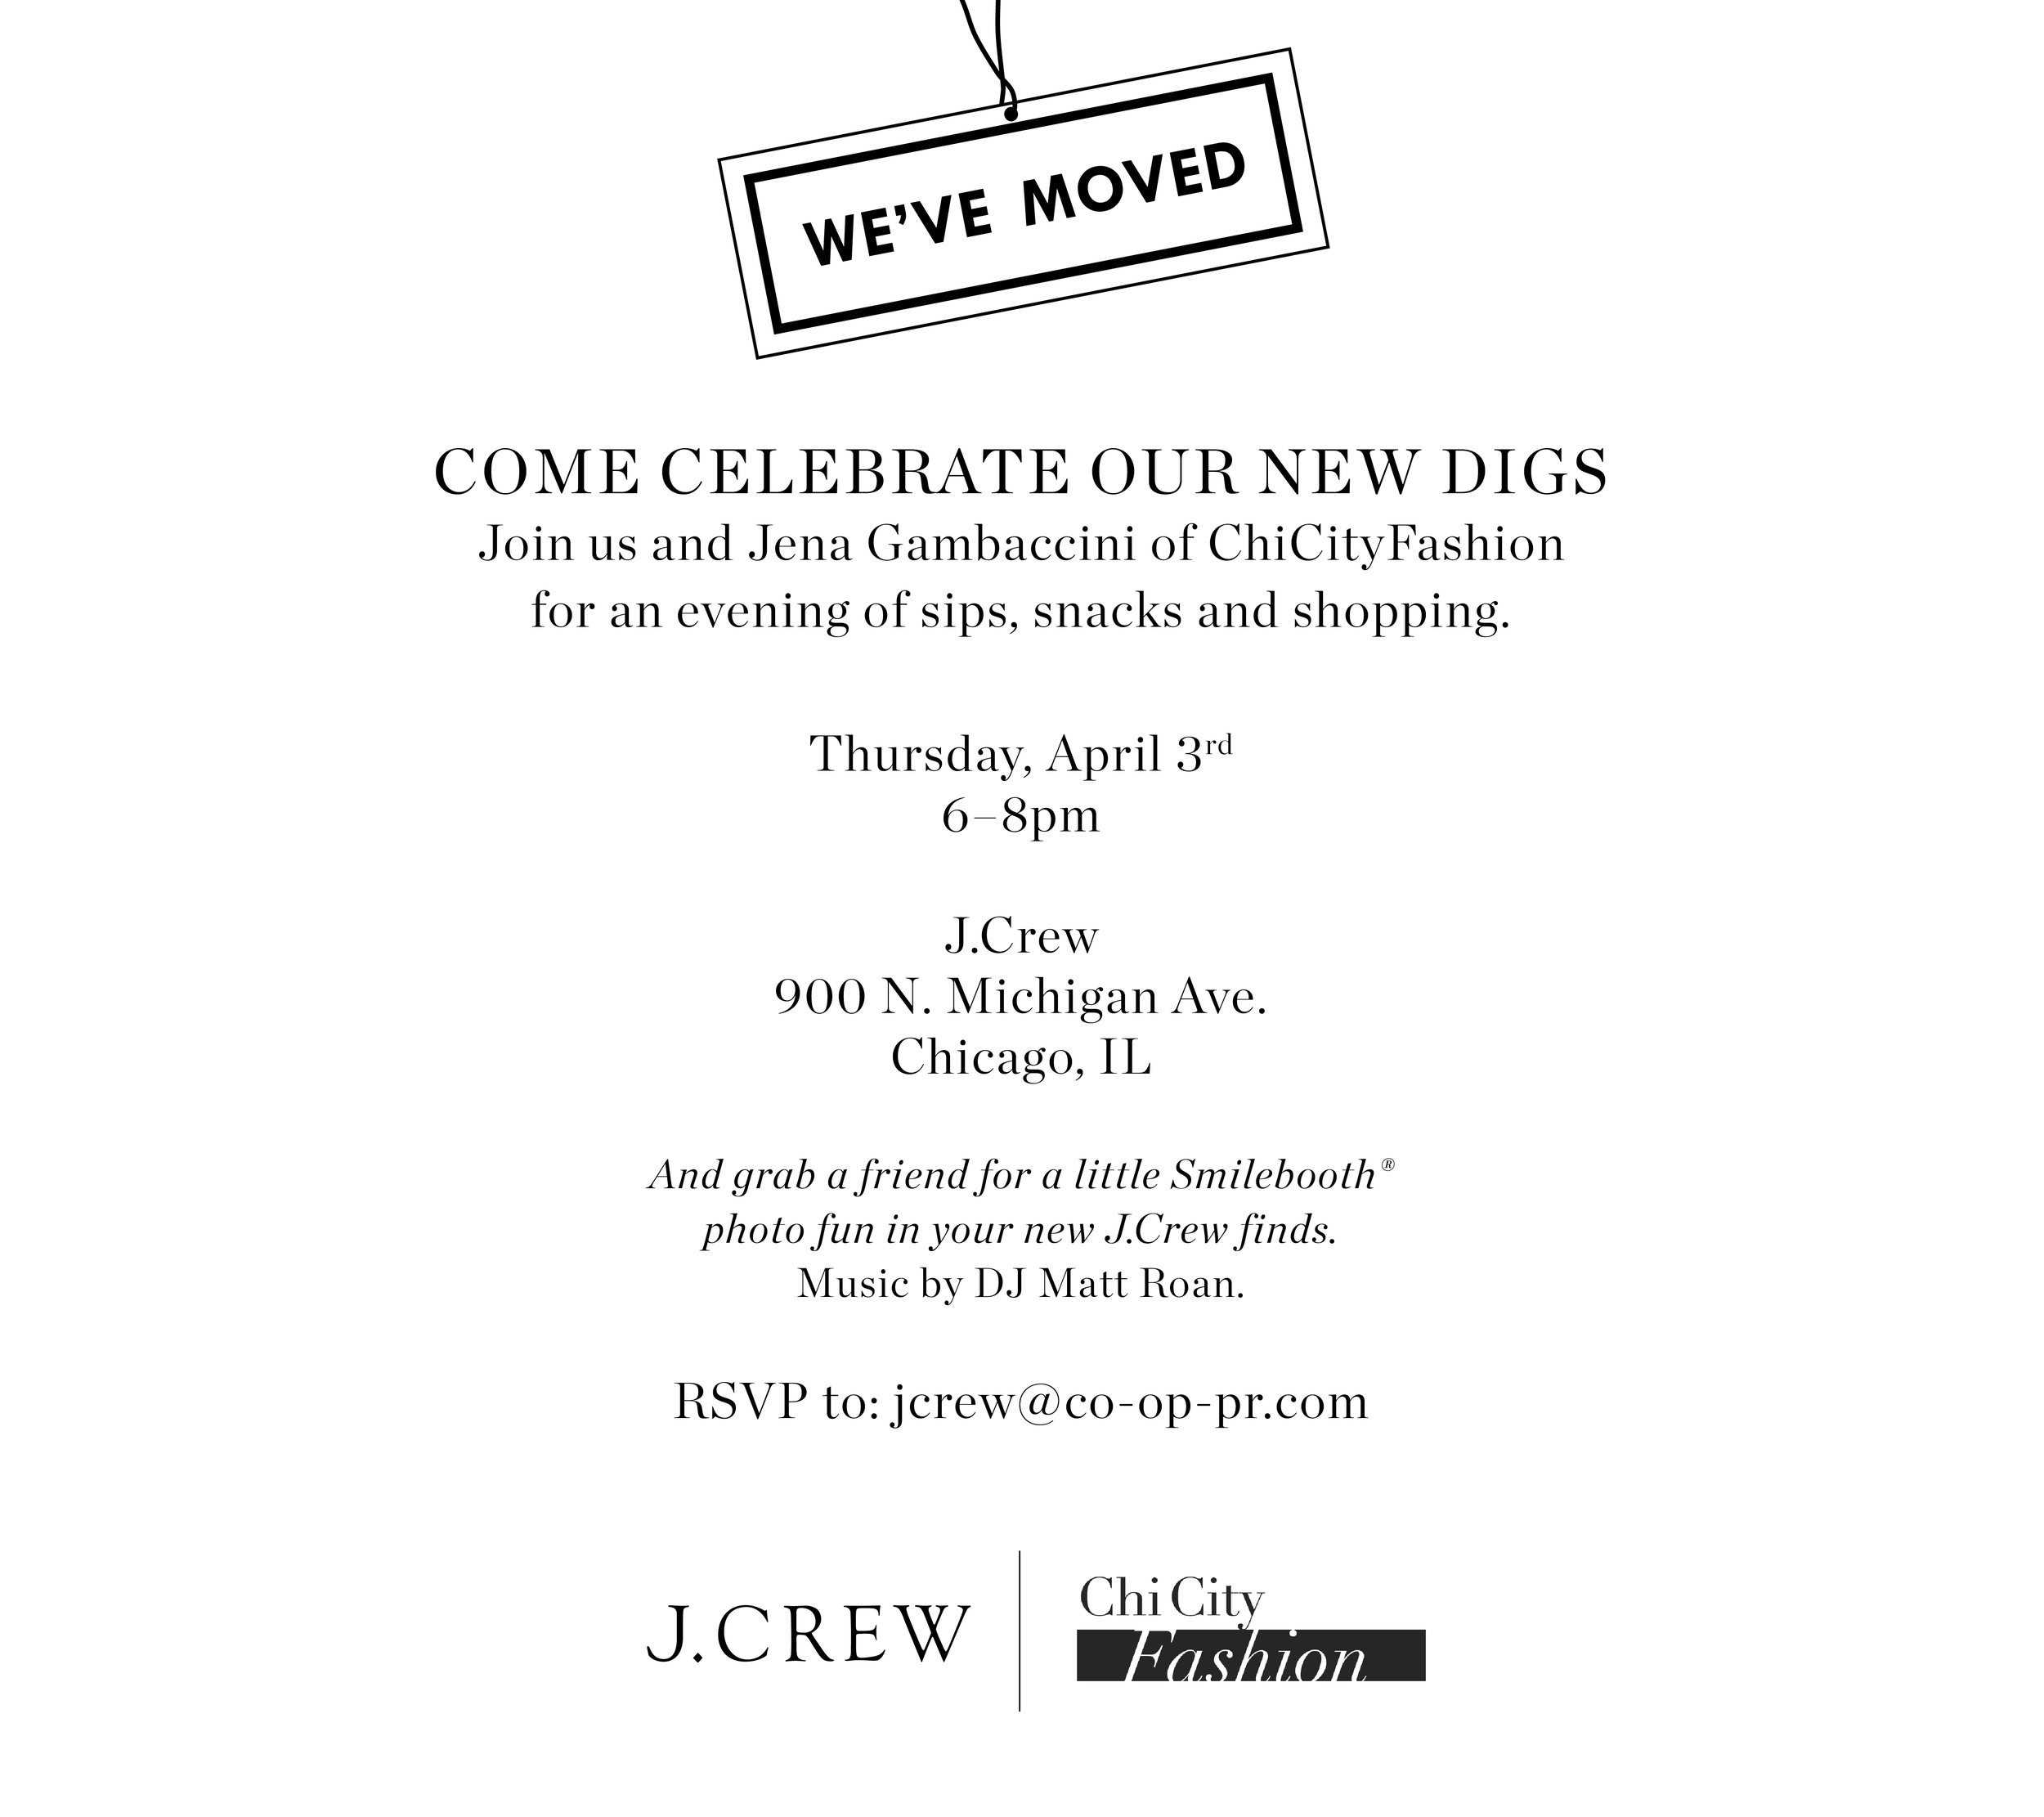 J.Crew April 3rd Event Invite.jpg